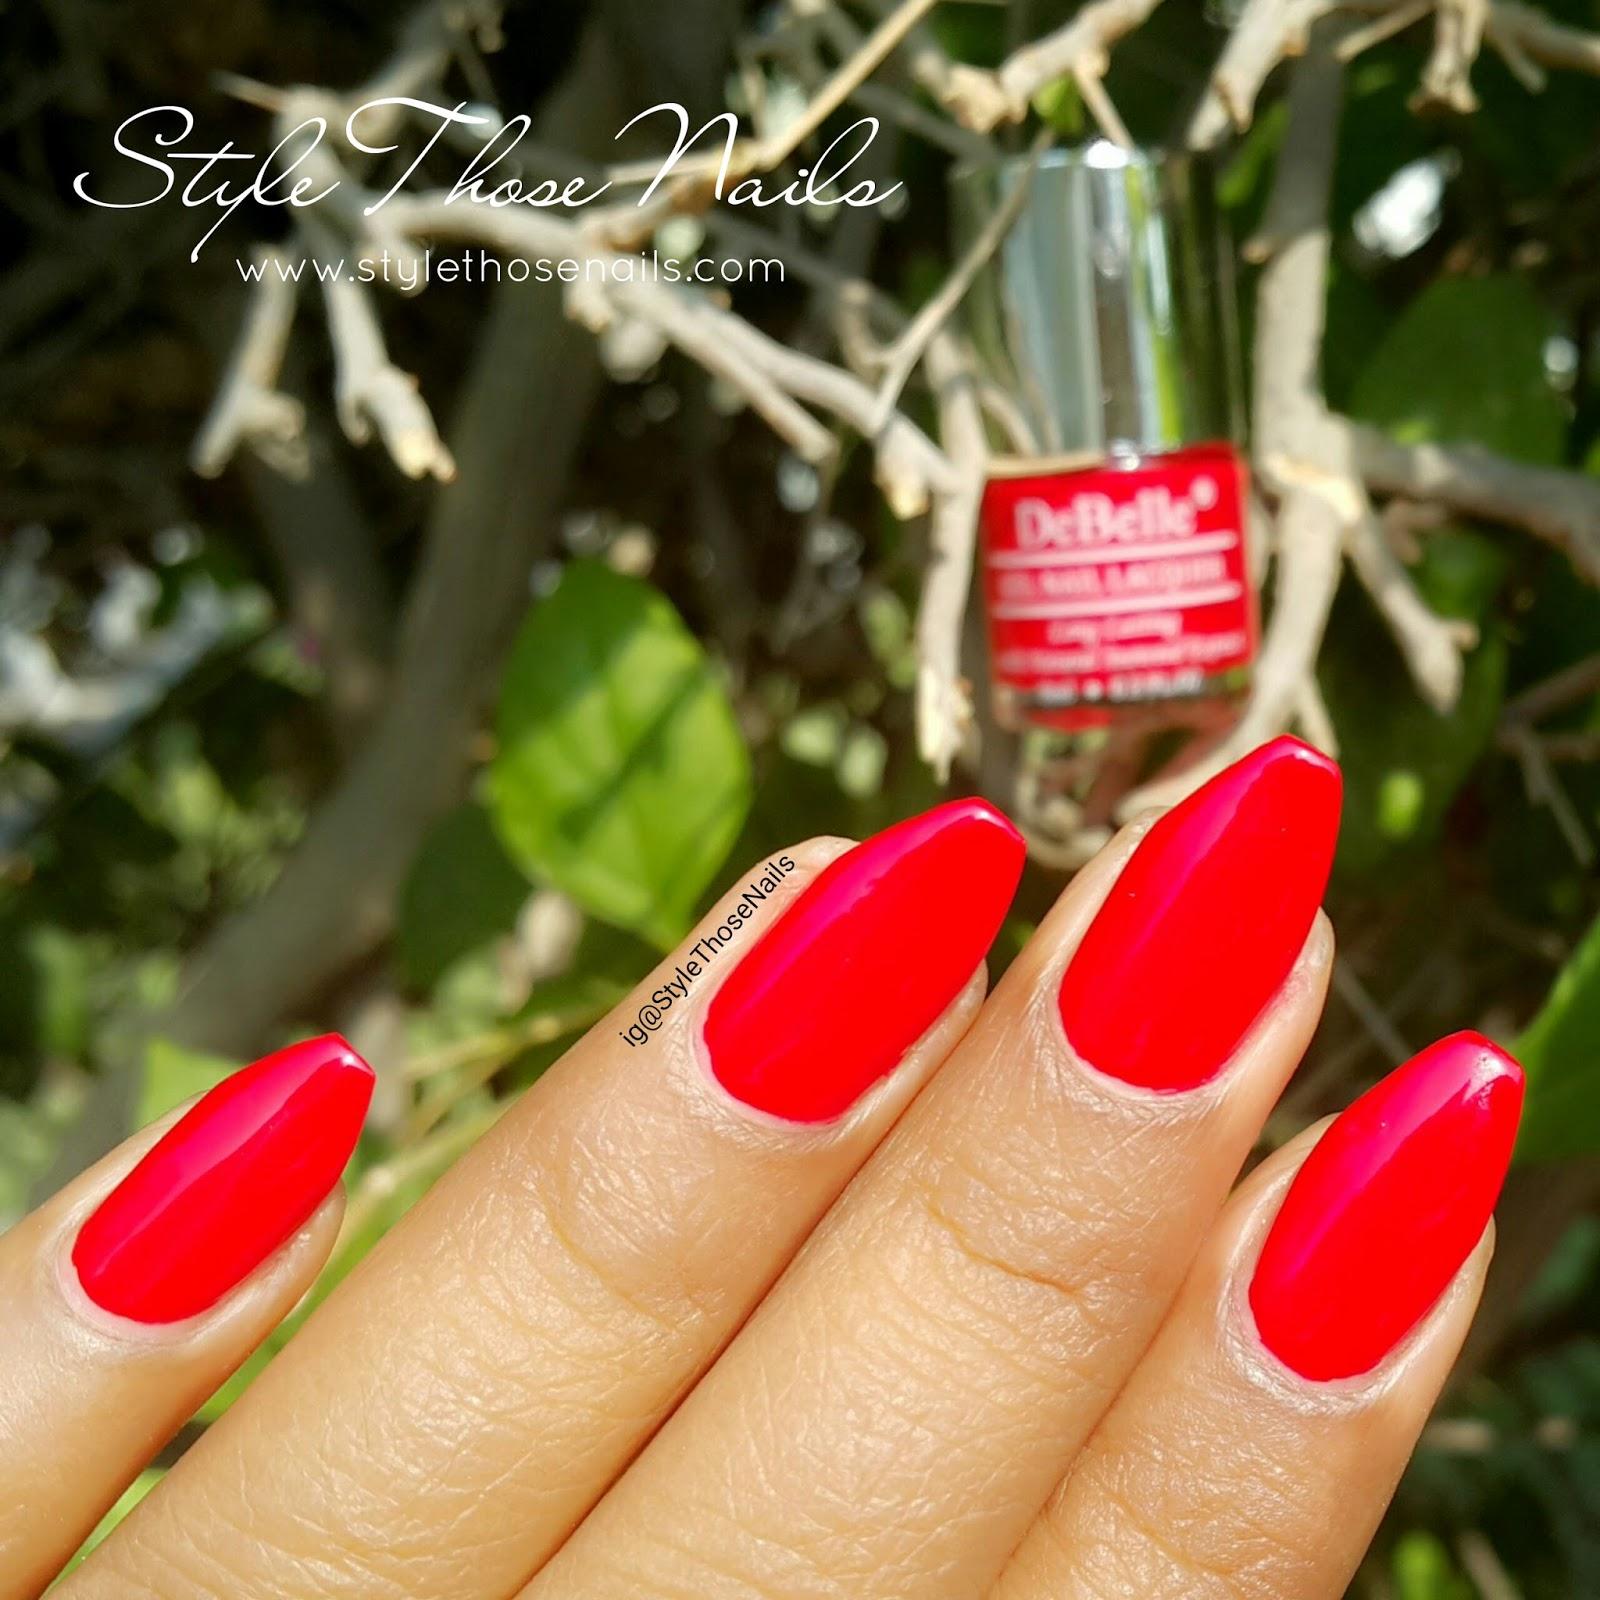 Style Those Nails: debelle nail polish